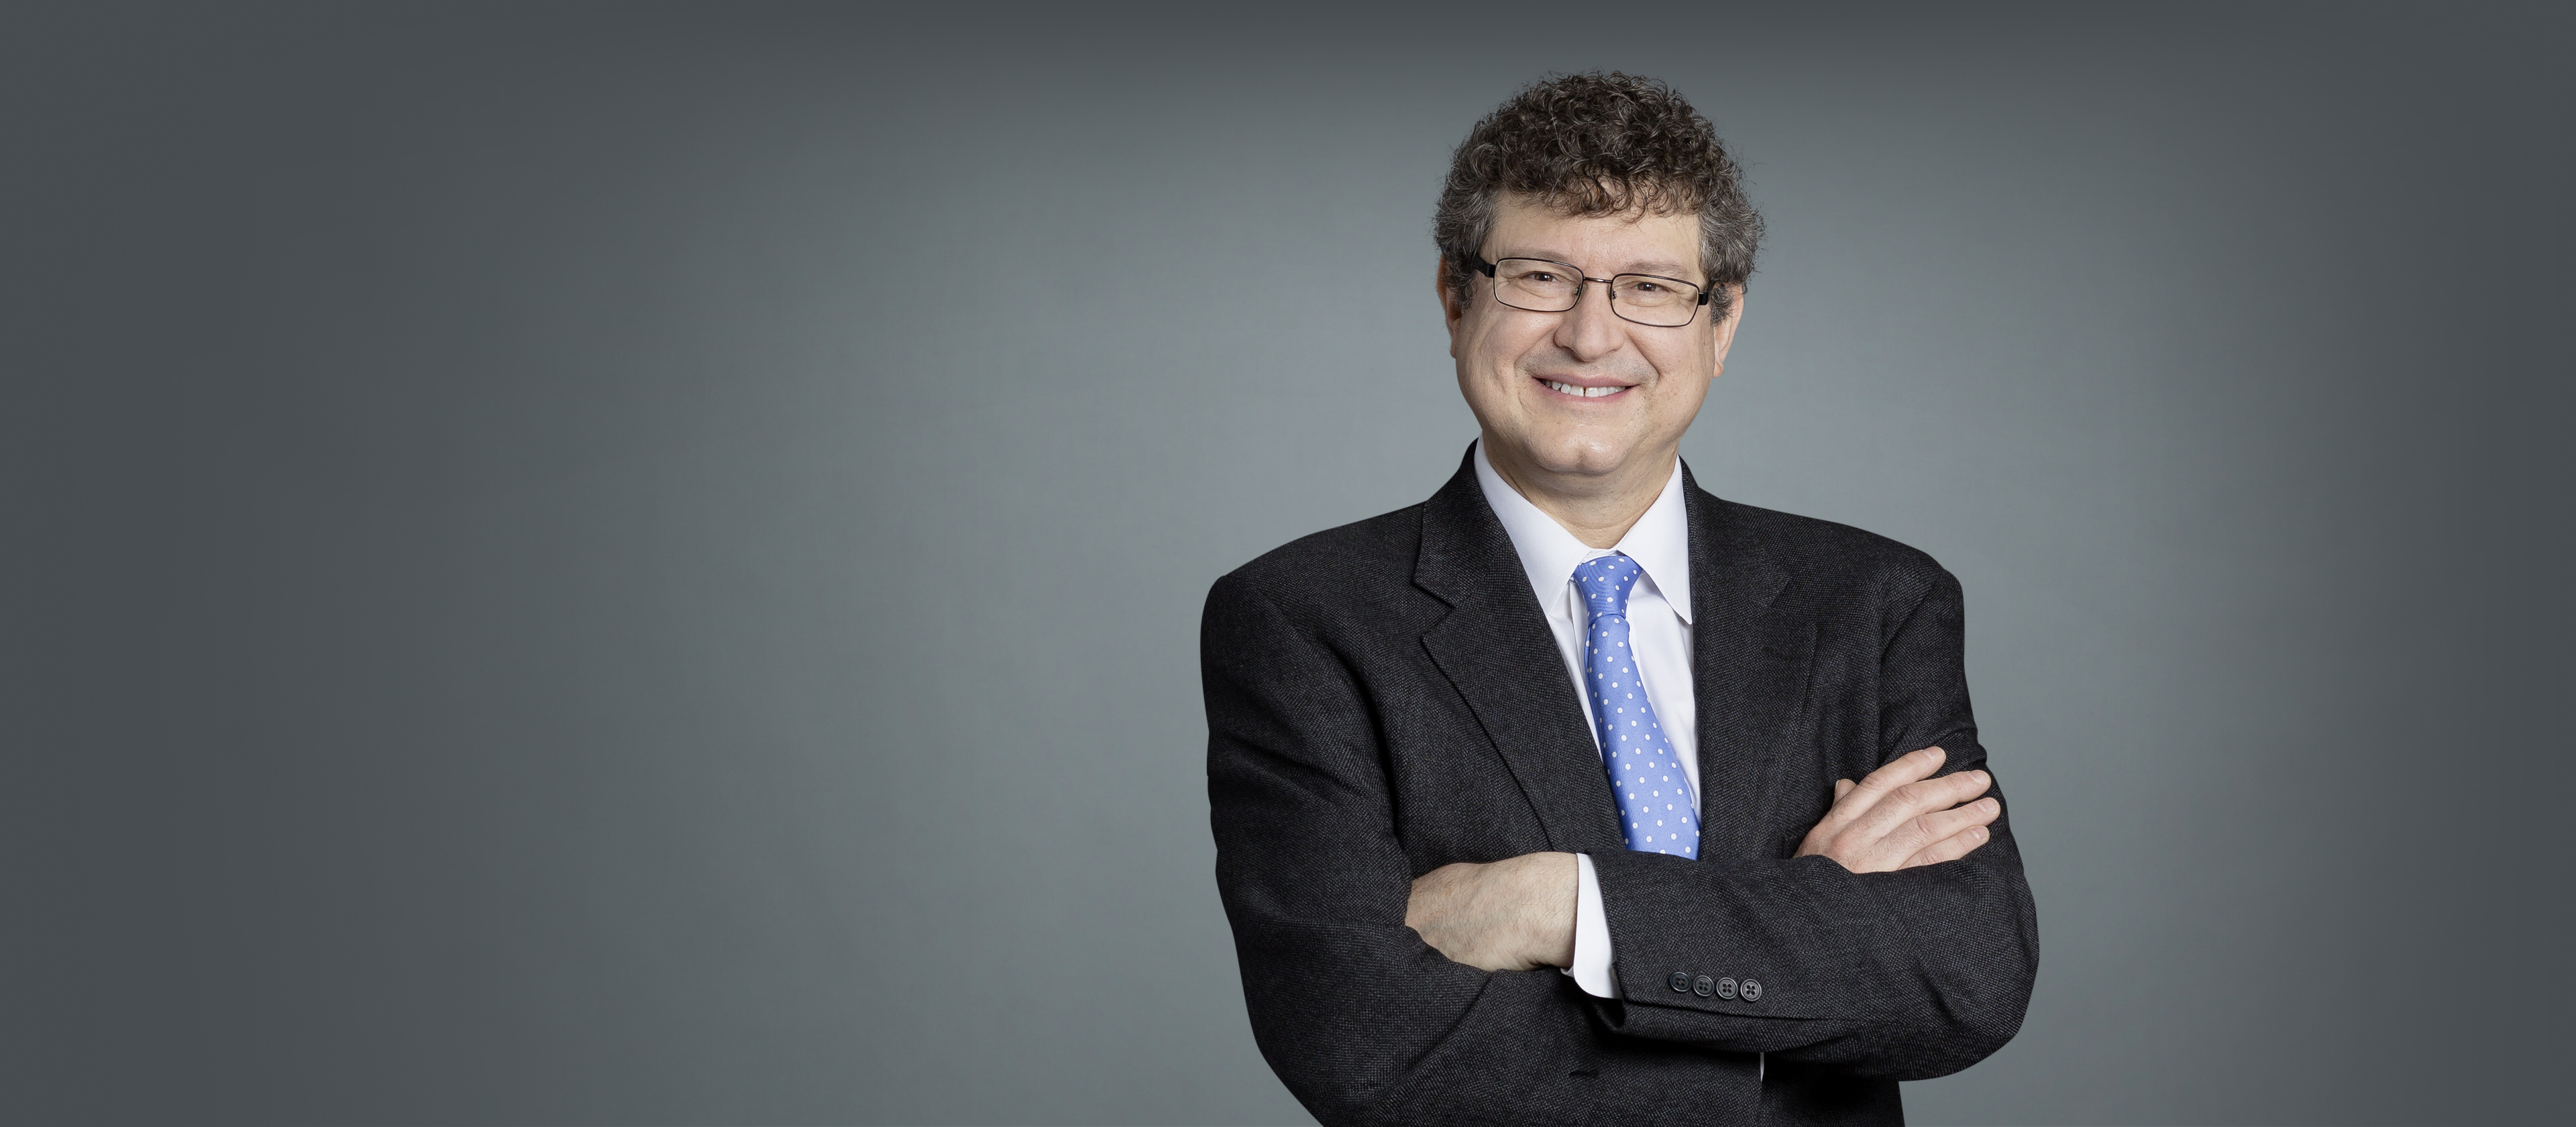 Alan L. Mendelsohn